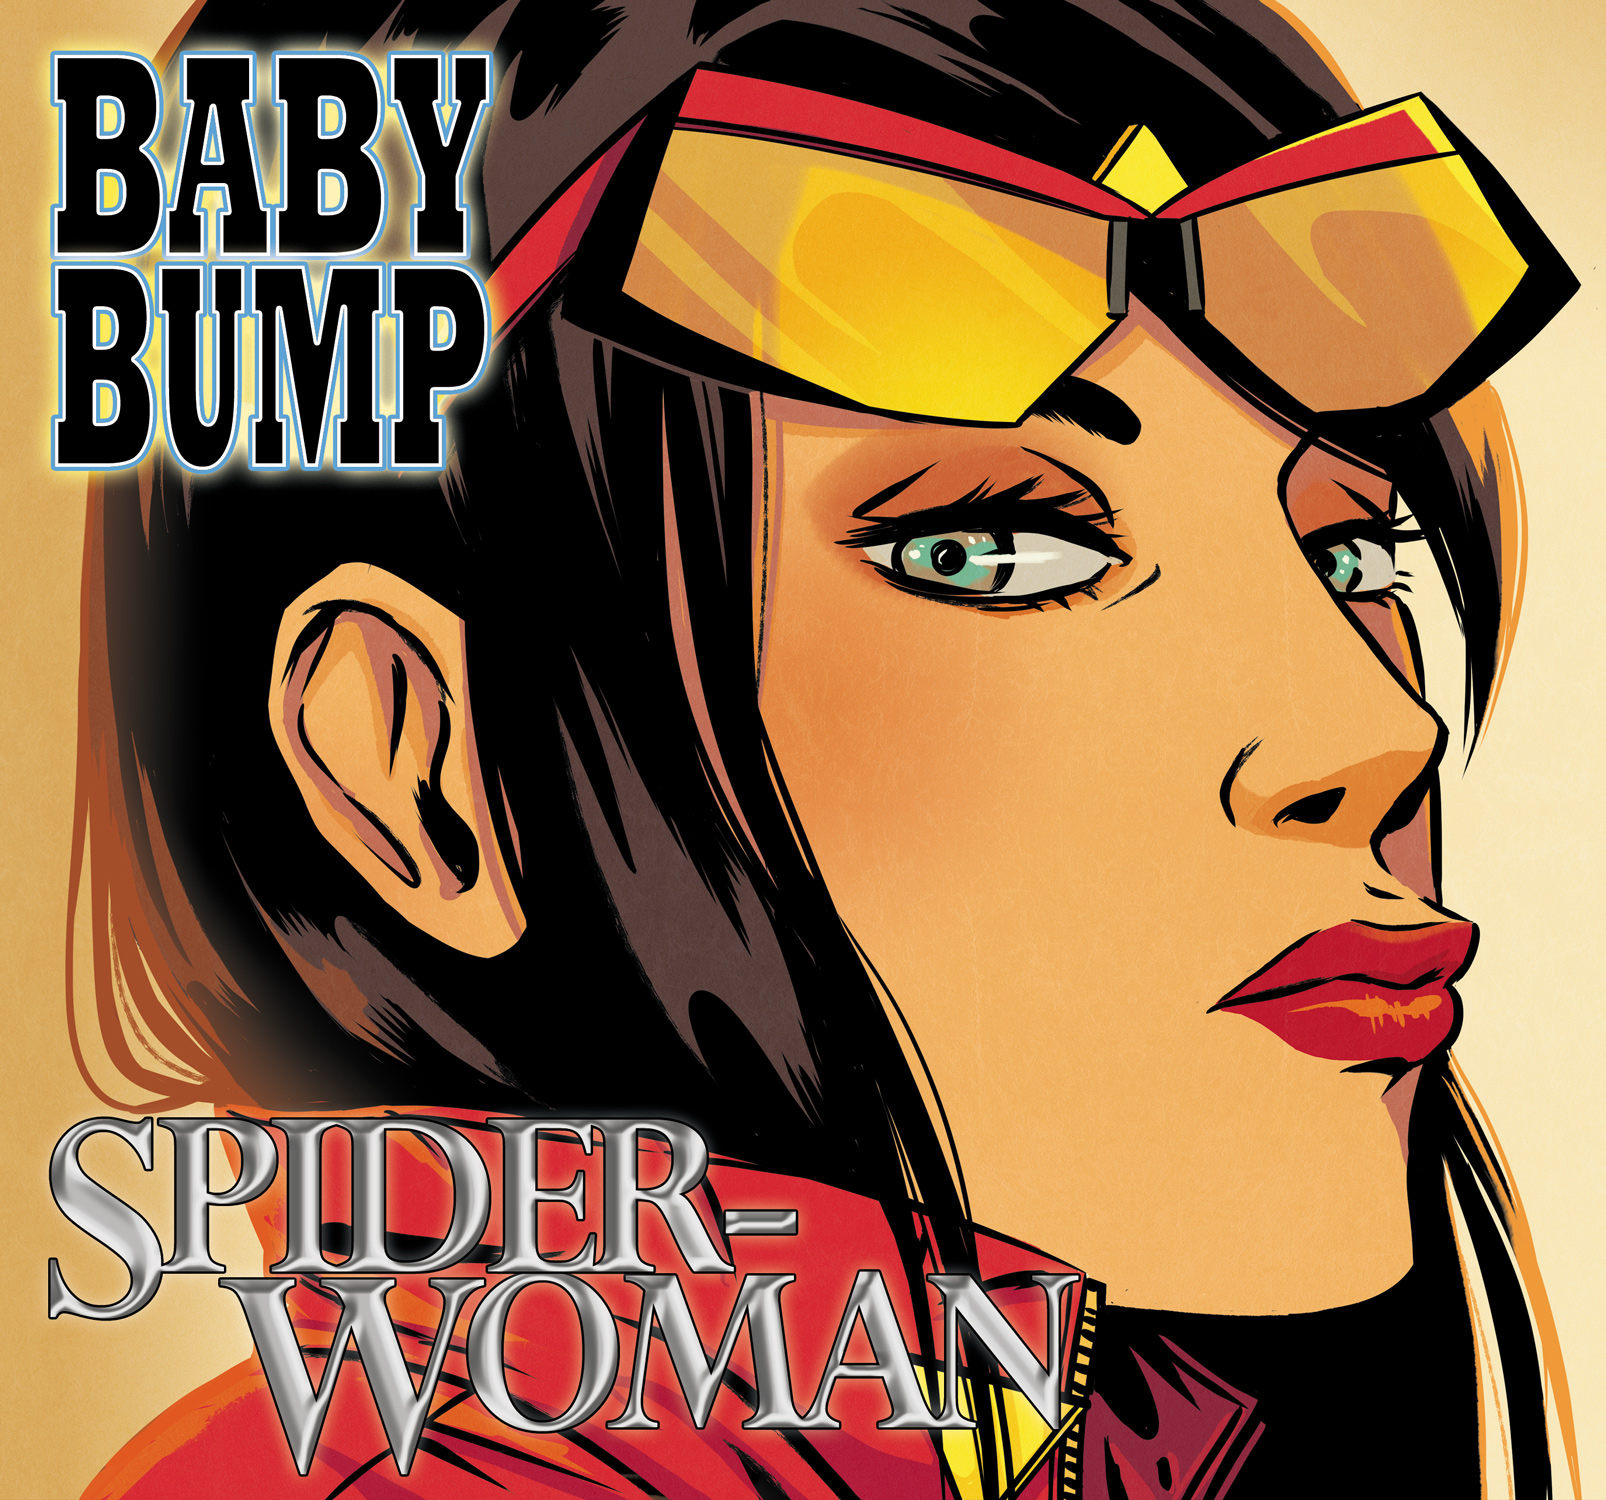 Spider-Woman (2015) #1 (Bustos Hip-Hop Variant)